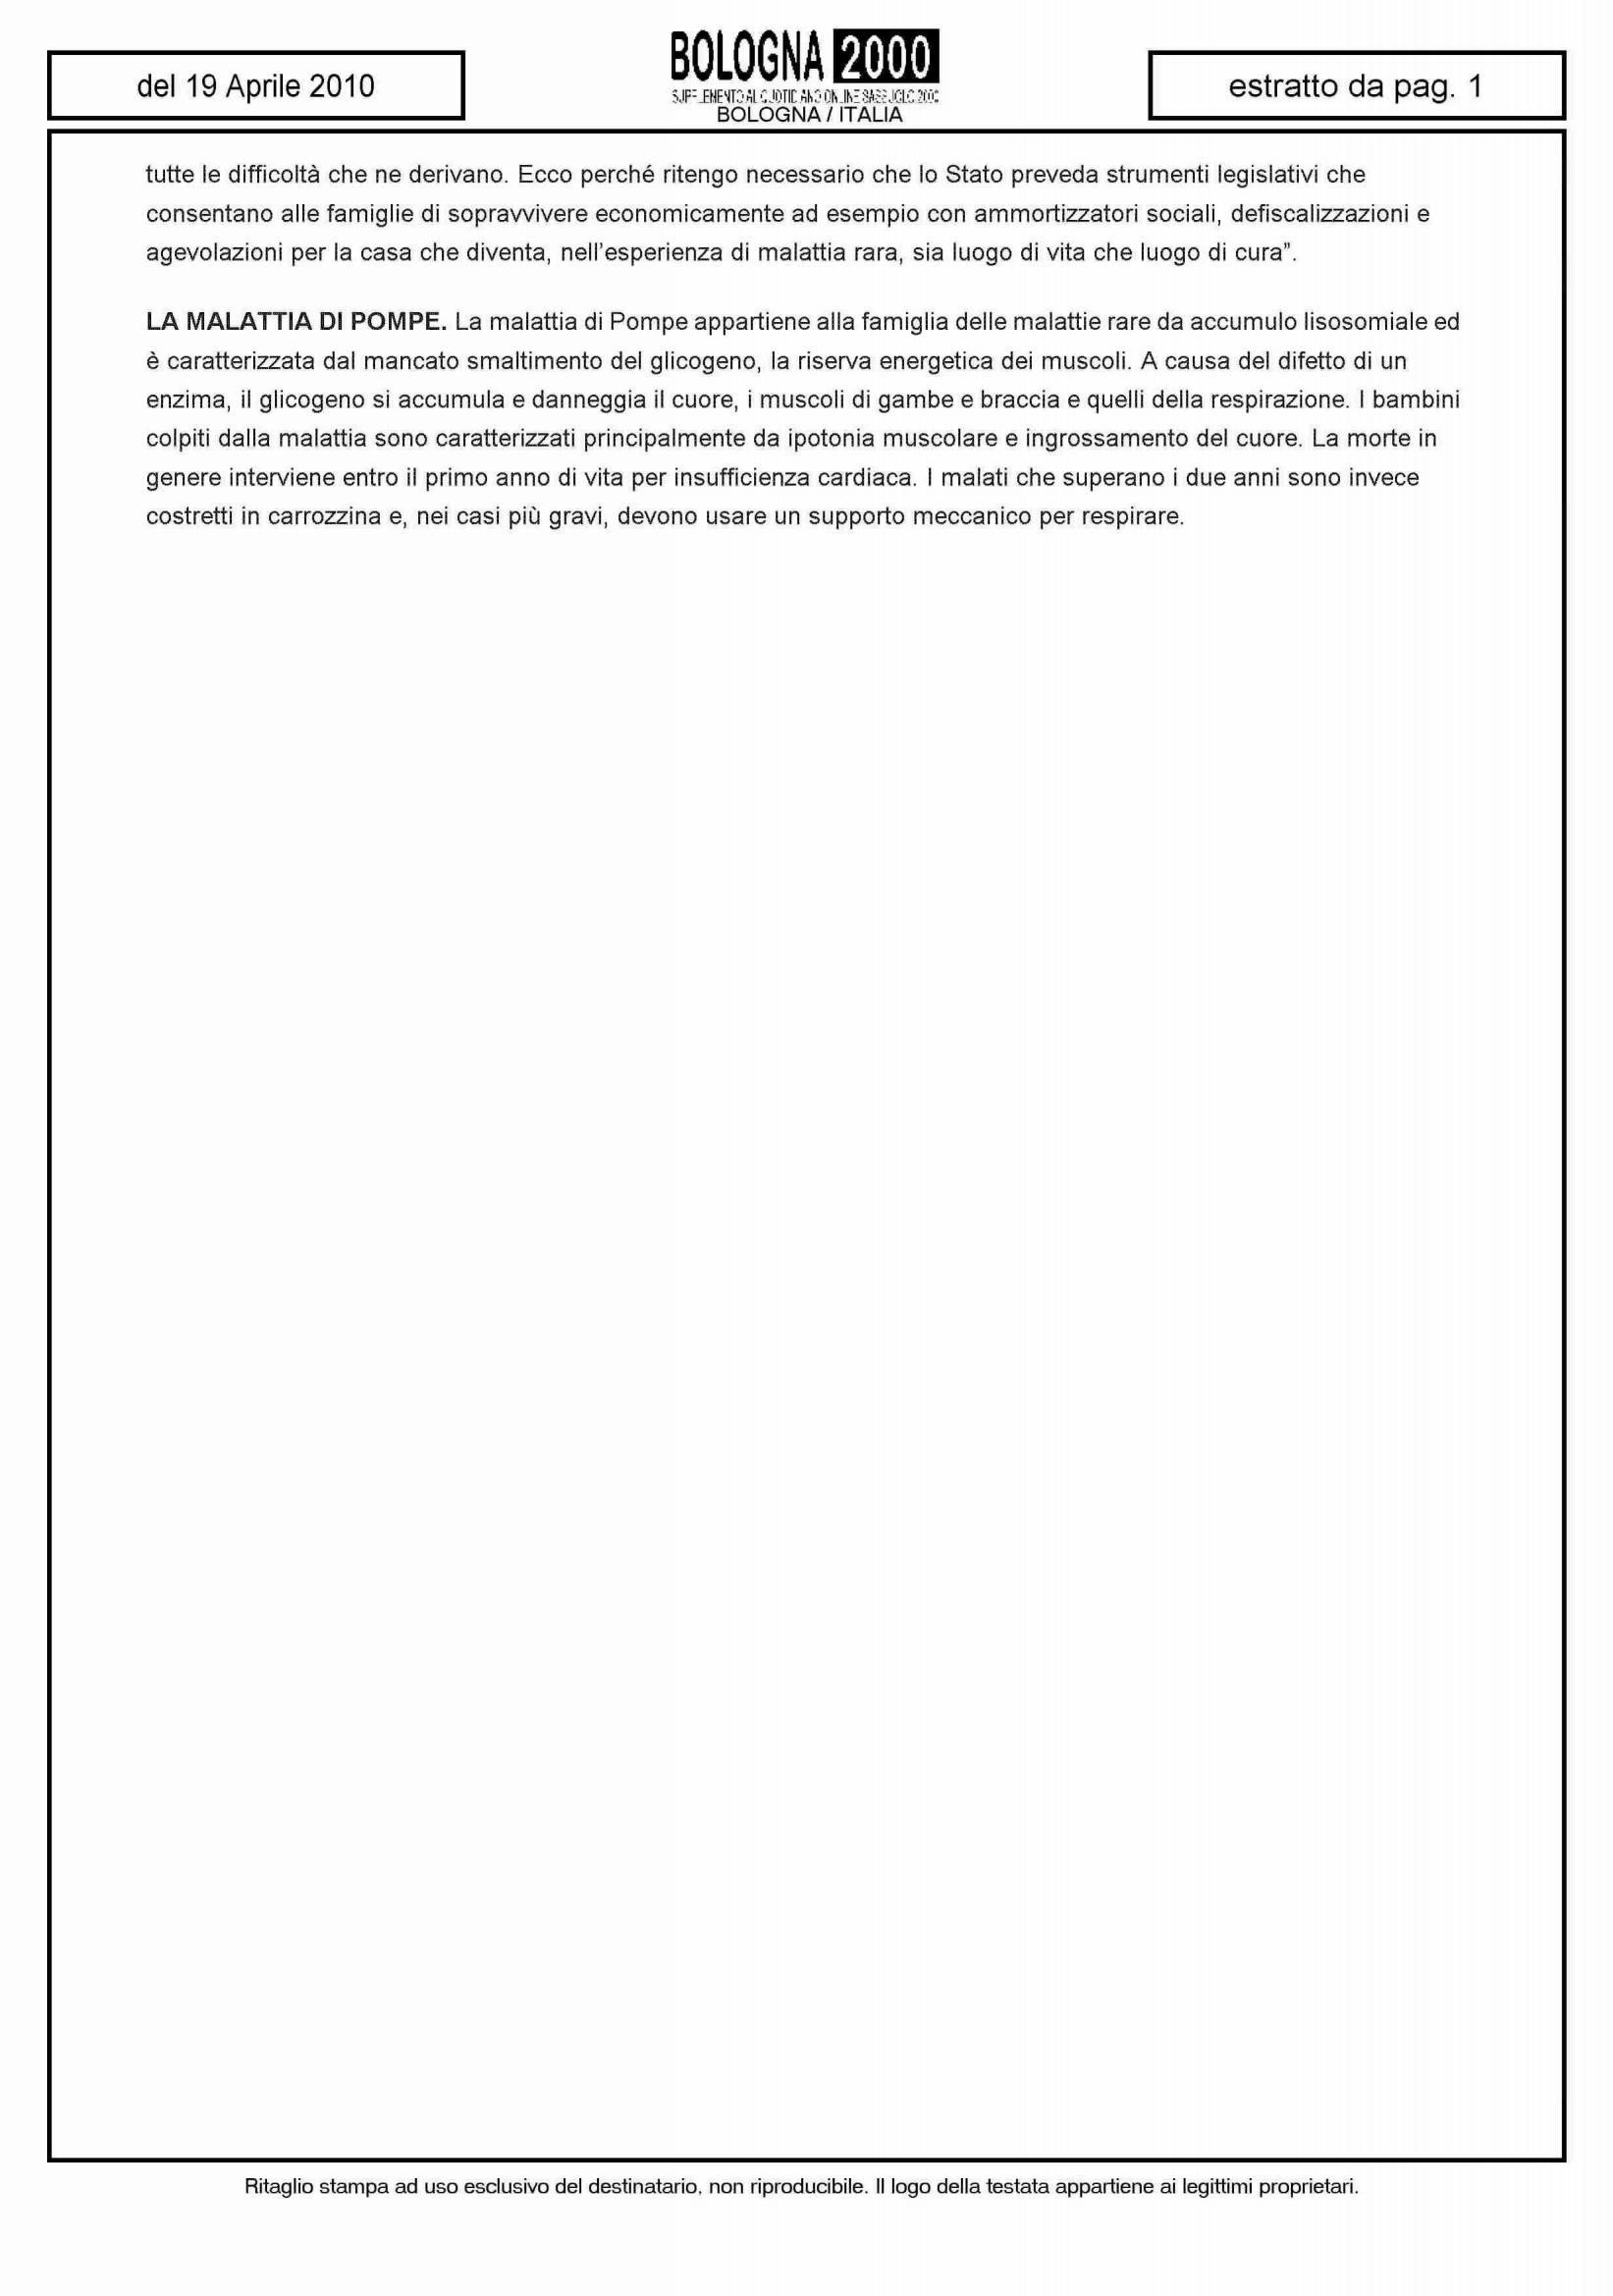 Stampa_20100422_misure straordinarie_Page_36